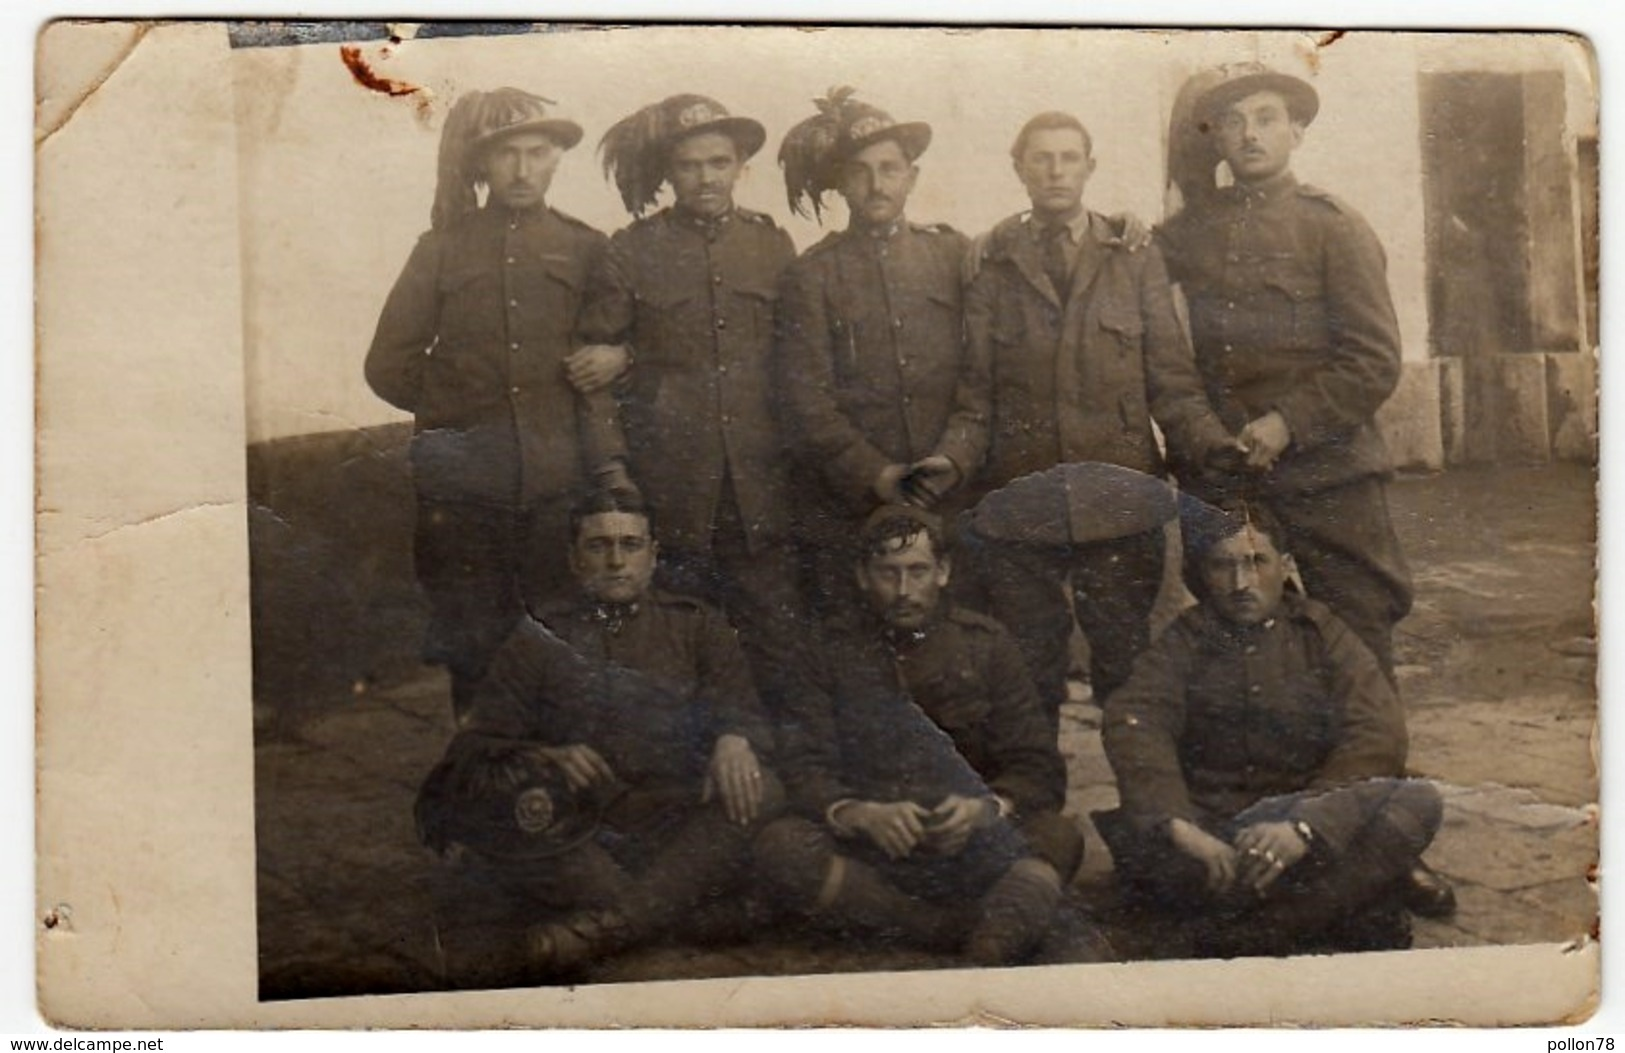 VECCHIA FOTOGRAFIA - OLD PHOTO - MILITARI - BERSAGLIERI - 1919 - Vedi Retro - Oorlog, Militair